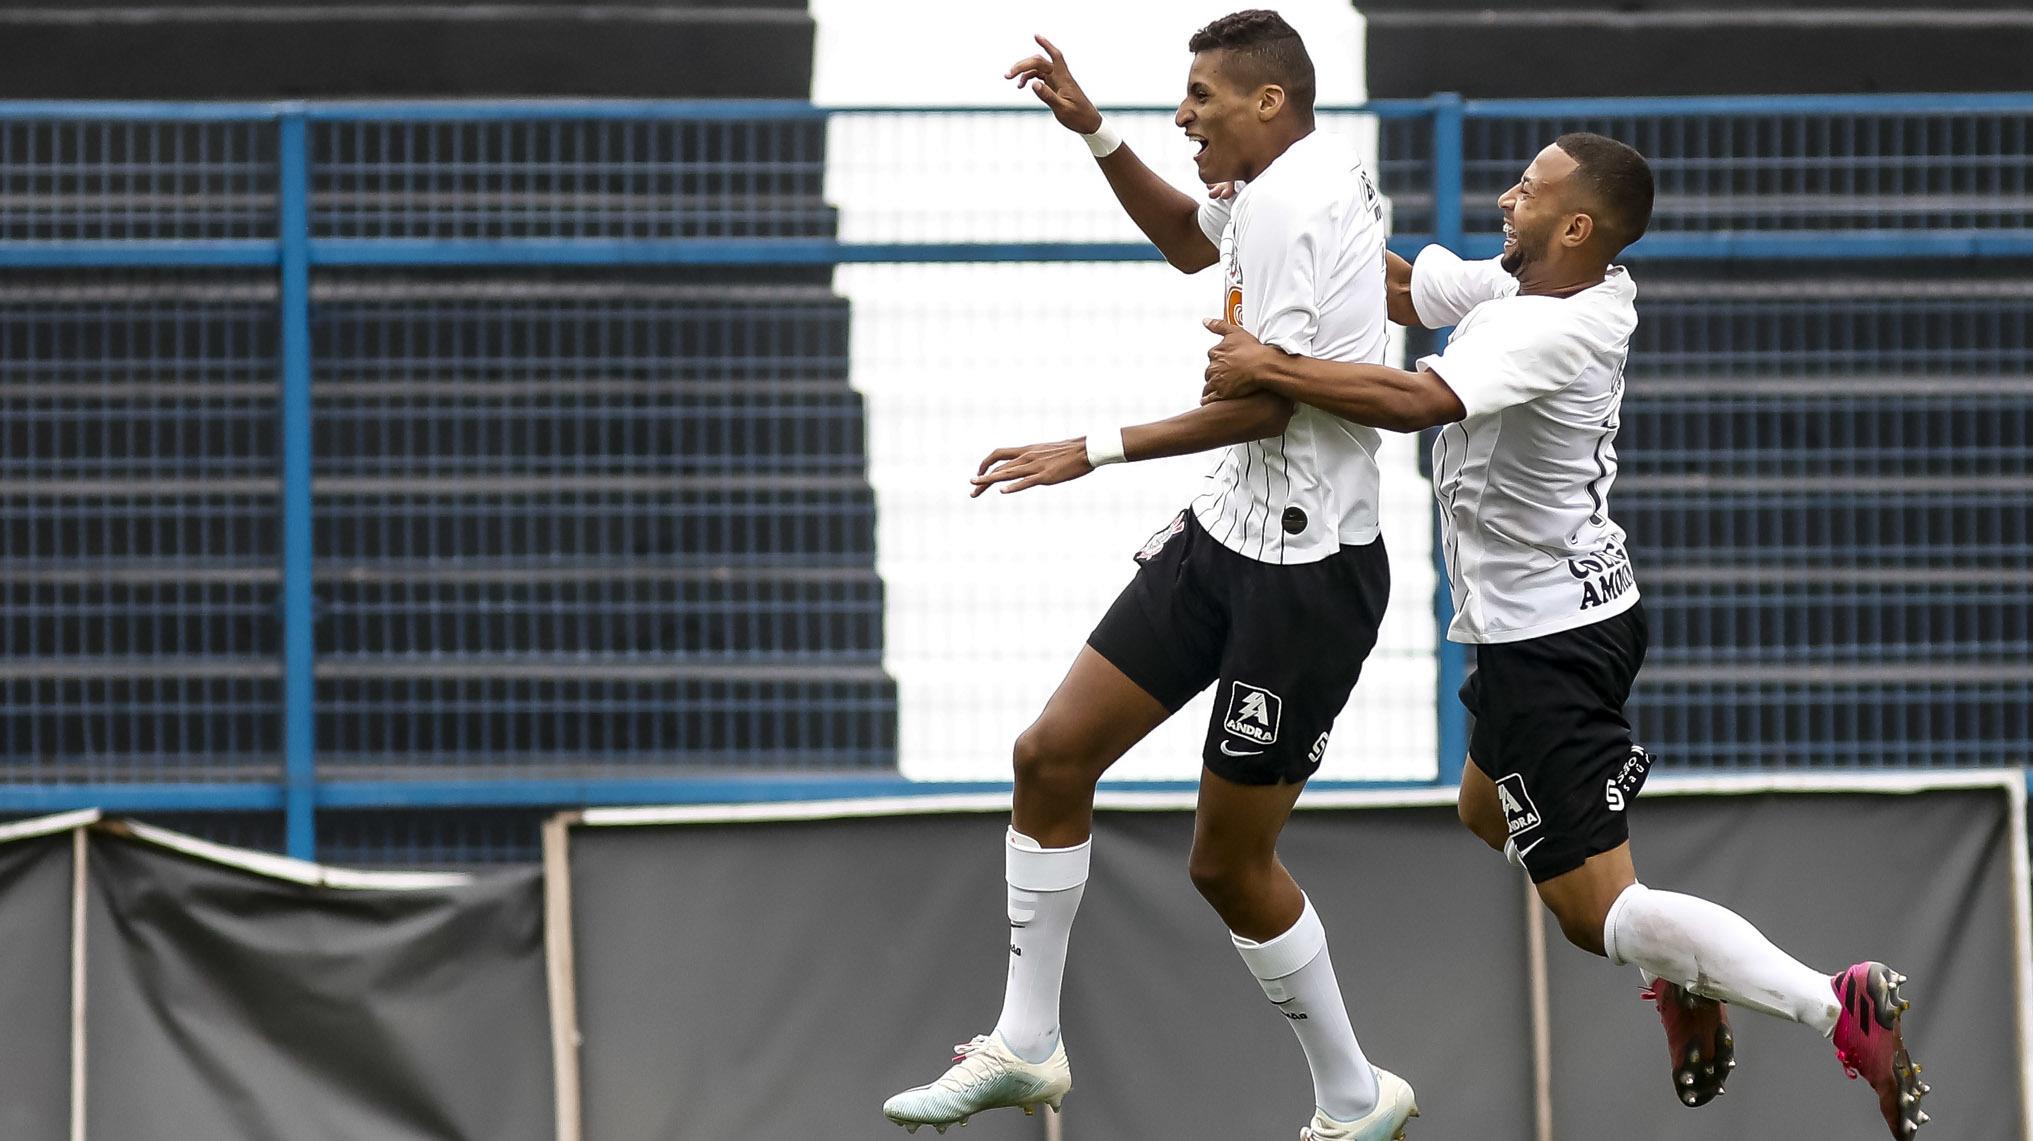 Paulista Sub-17: Corinthians x Primavera - Quartas de Final - Volta